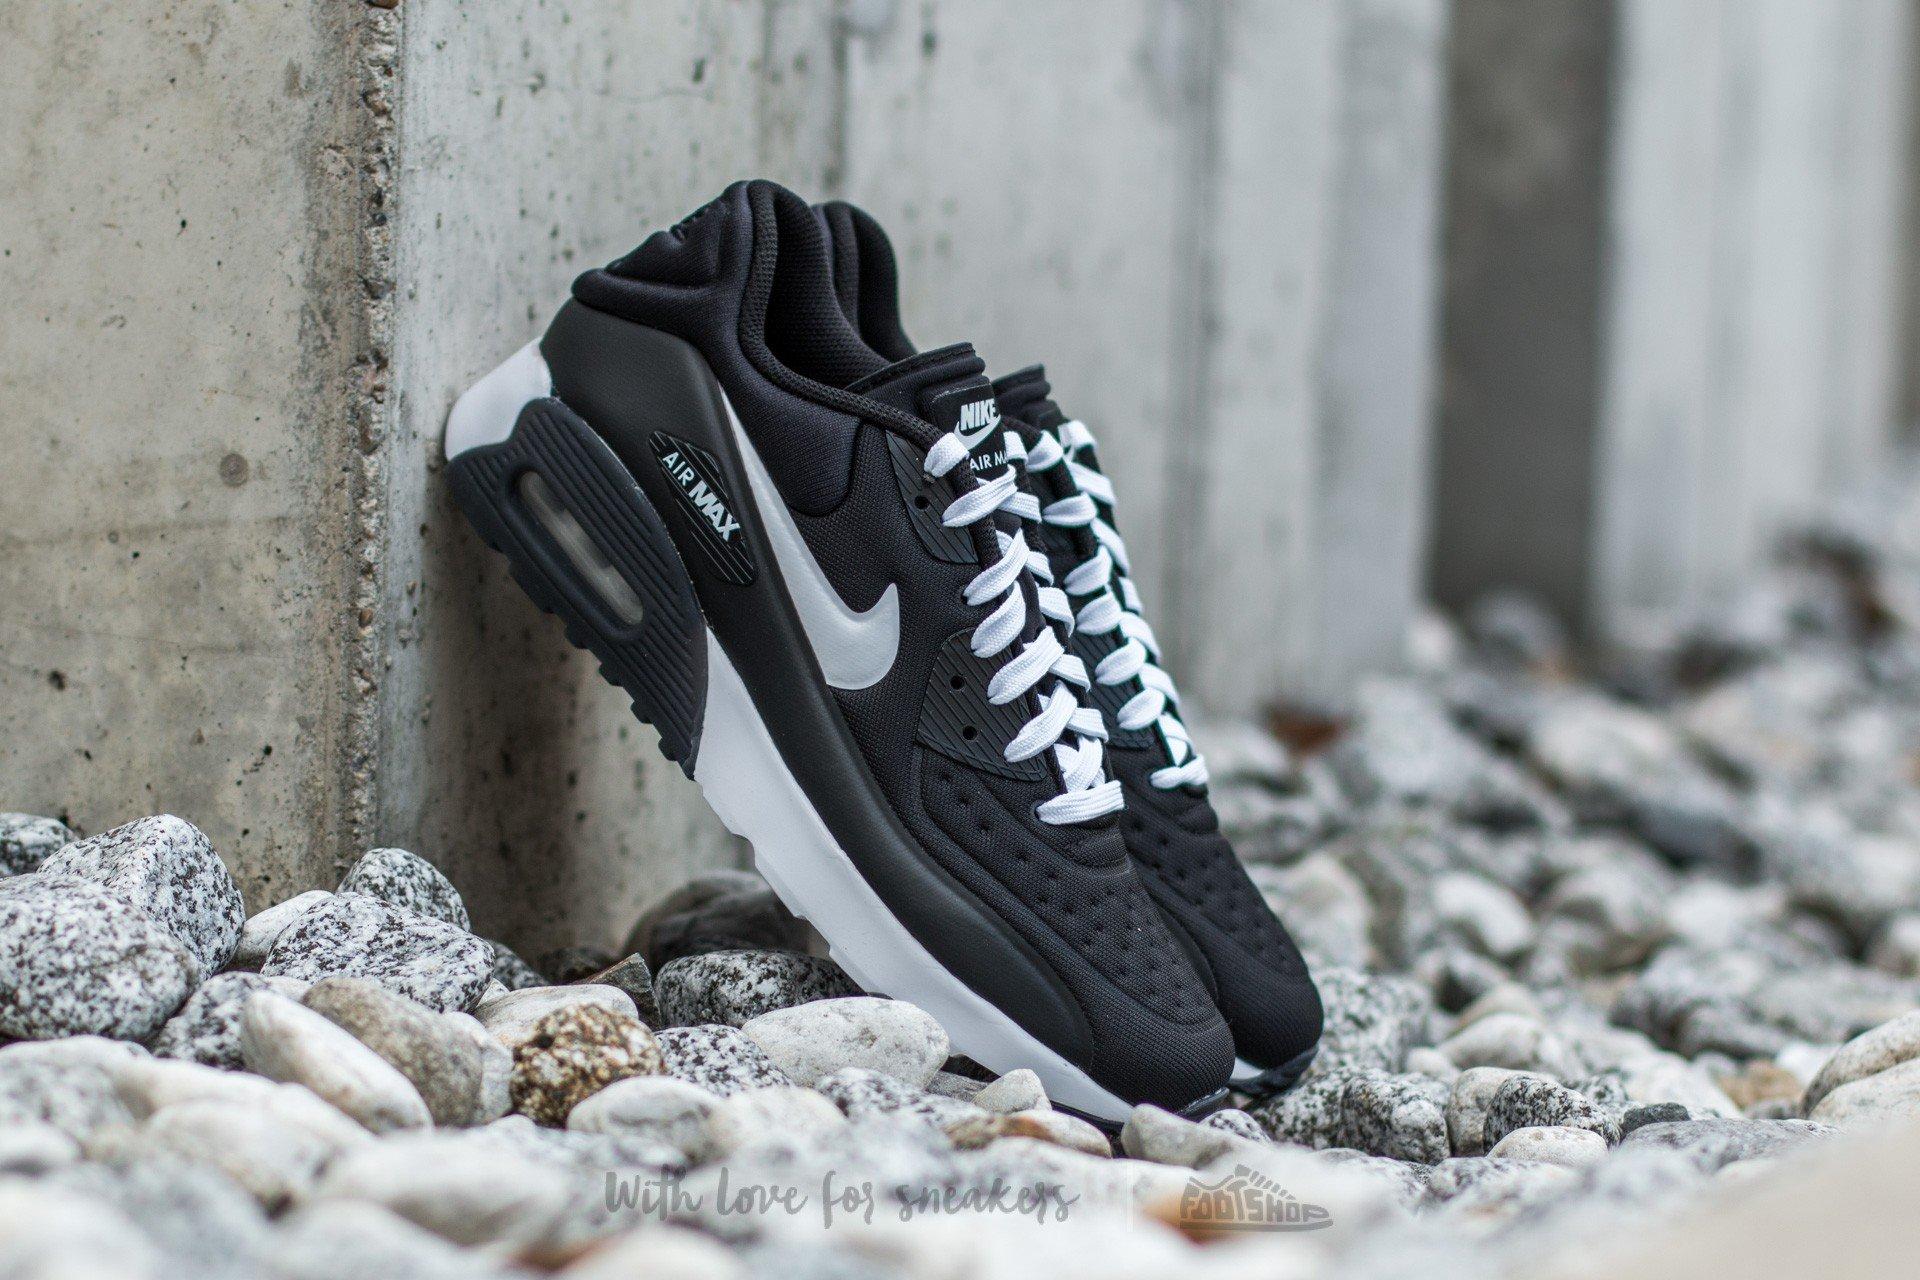 premium selection 5ded2 607f0 Nike Air Max 90 Ultra SE. Black  White-Anthracite-White